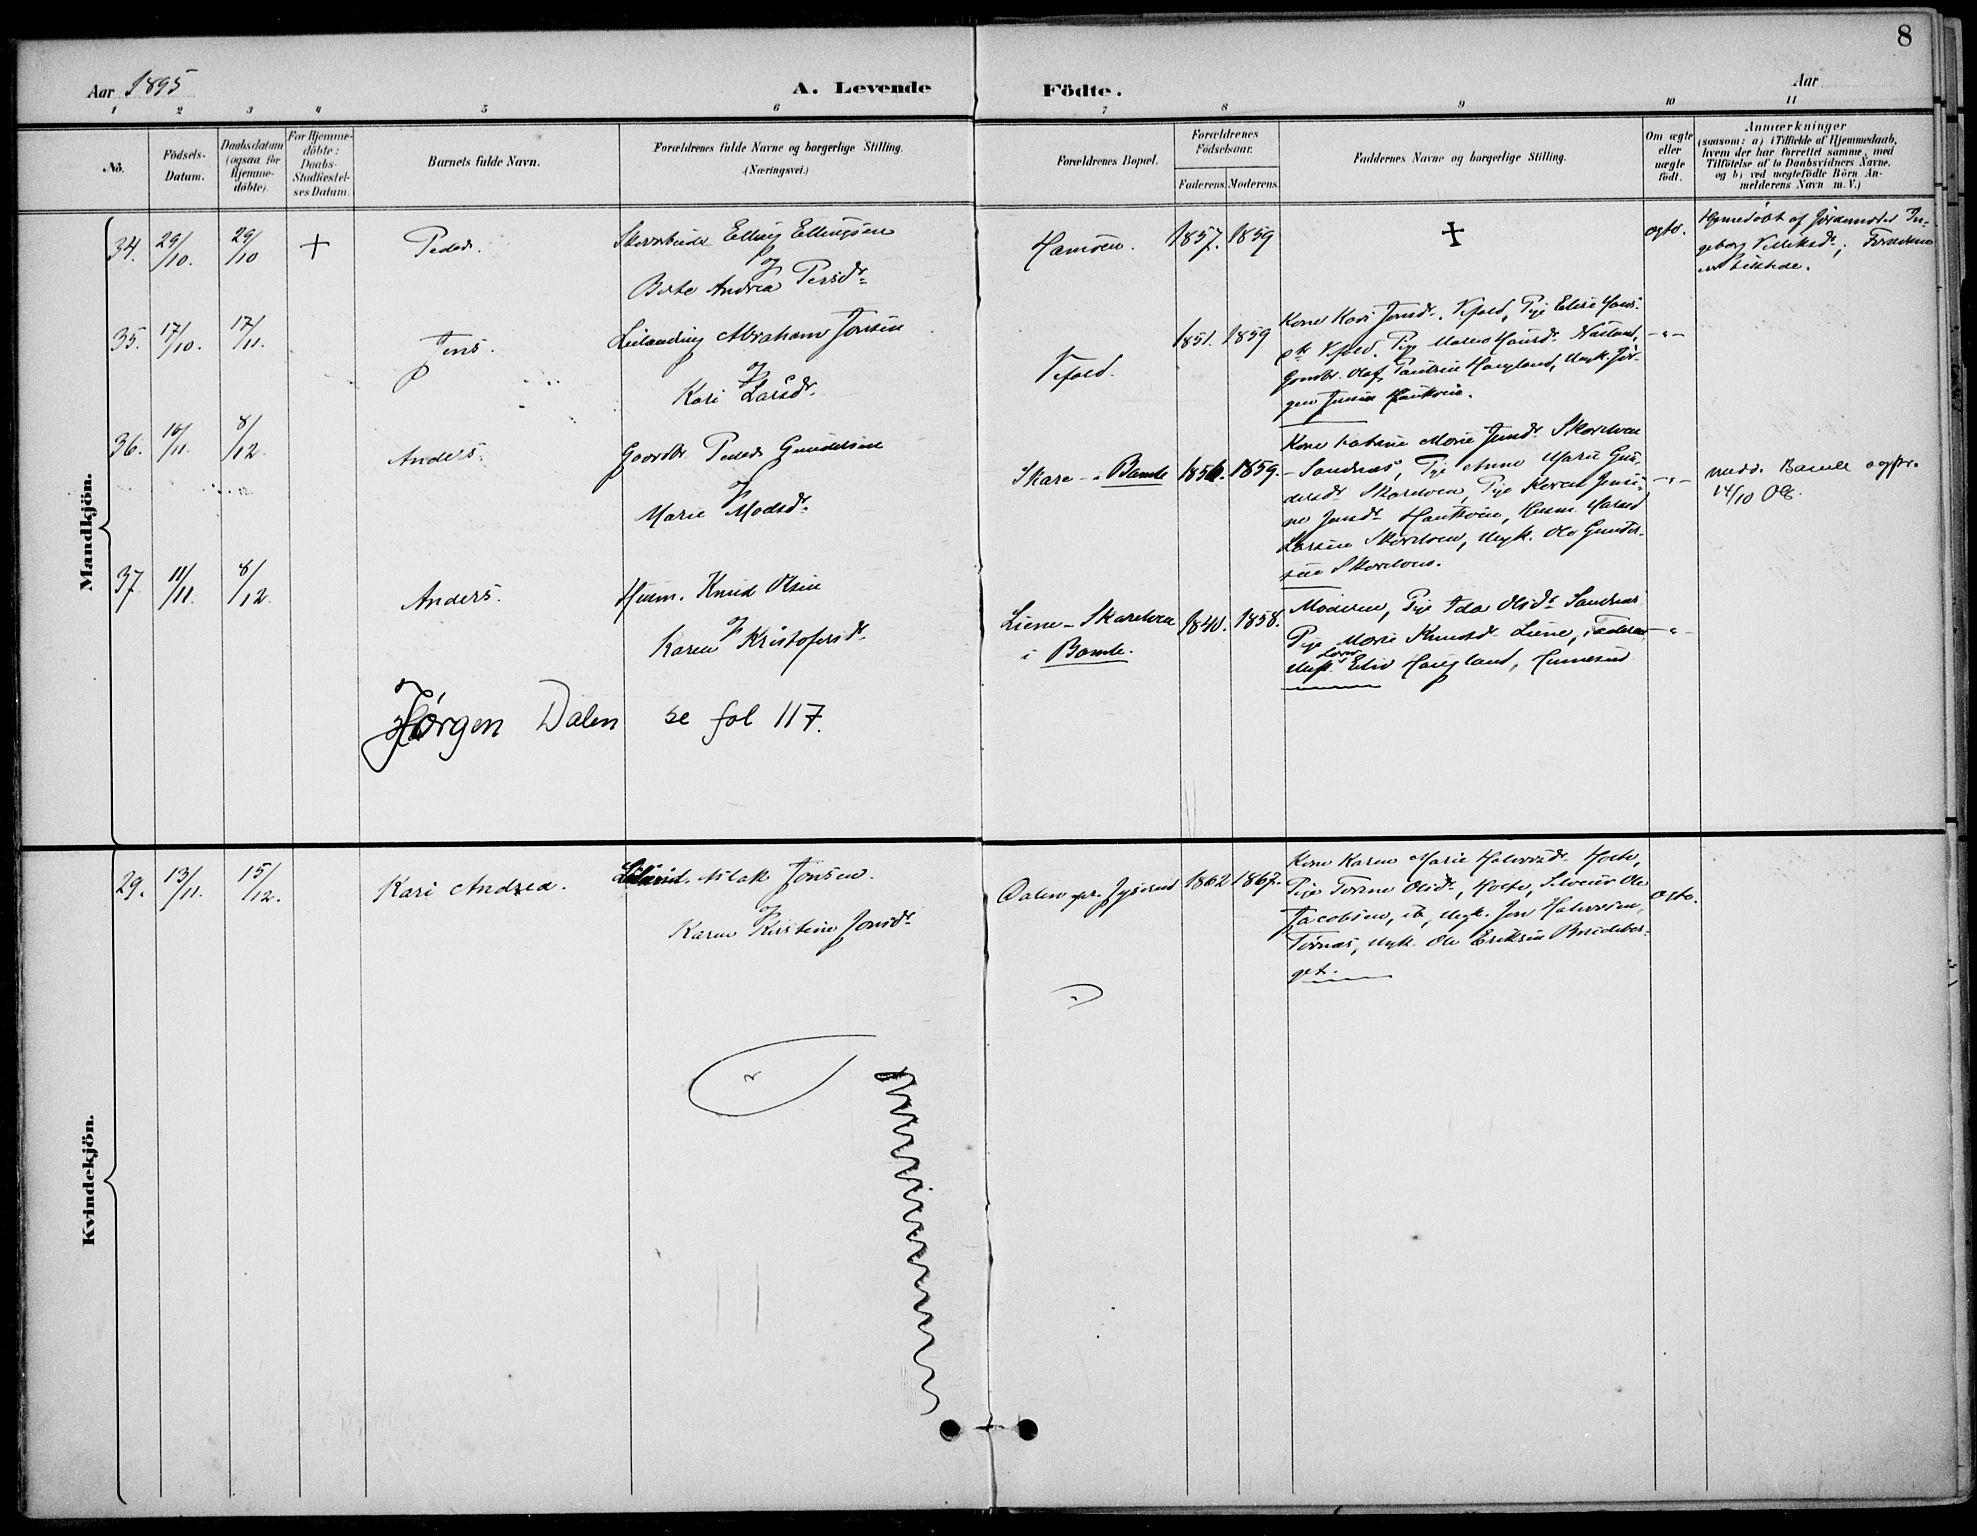 SAKO, Drangedal kirkebøker, F/Fa/L0012: Ministerialbok nr. 12, 1895-1905, s. 8